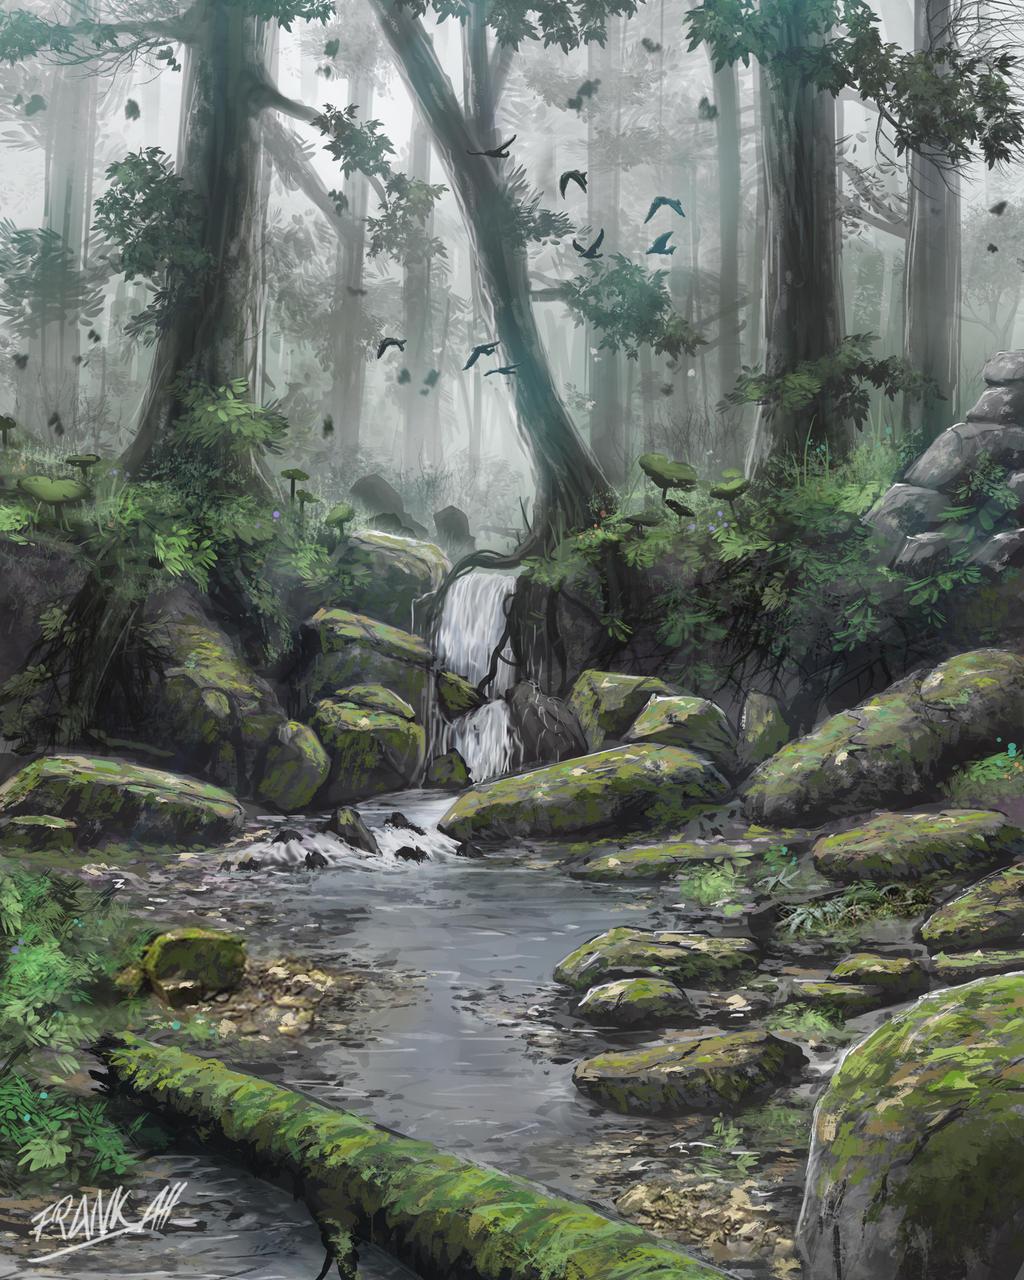 La dormeuse du val [Libre] Somewhere_in_the_undergrowth_by_frankatt-d93zhih